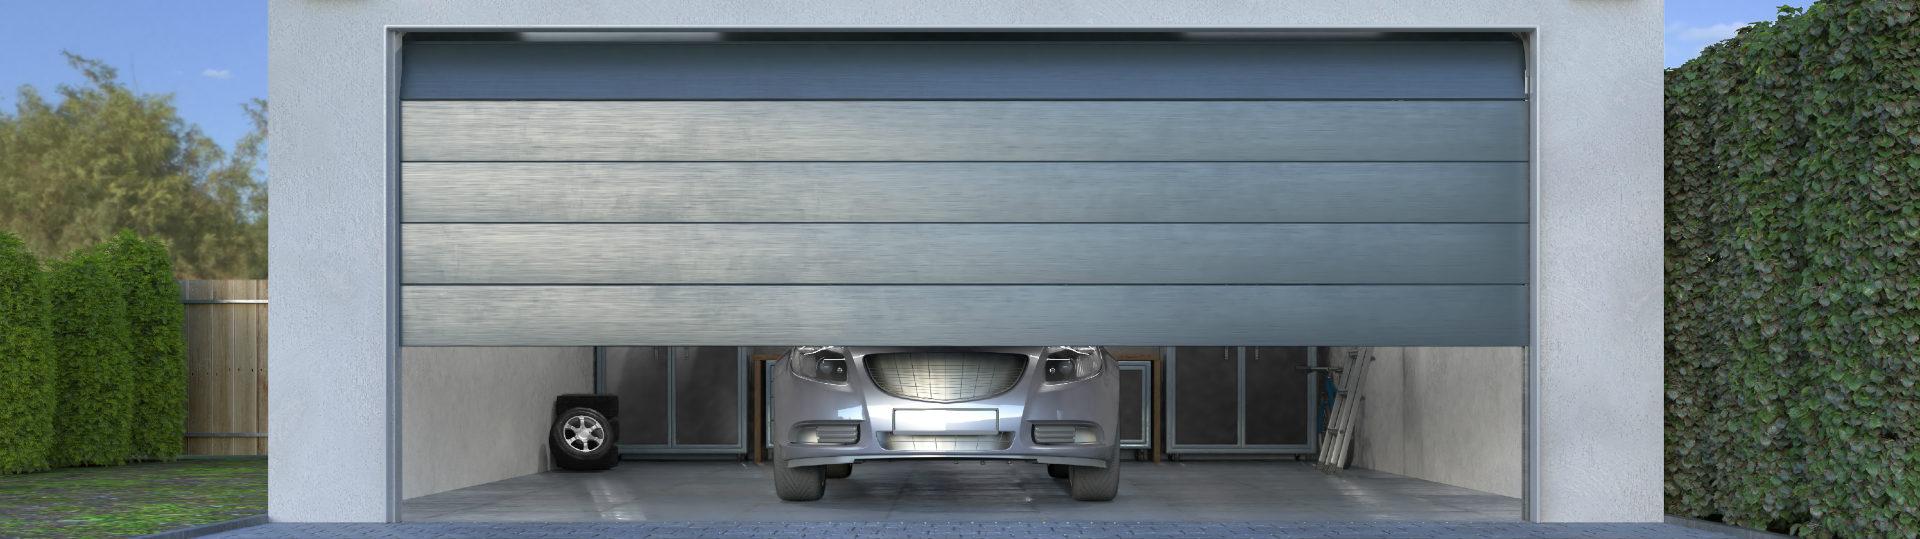 platteau sectionale garagepoort